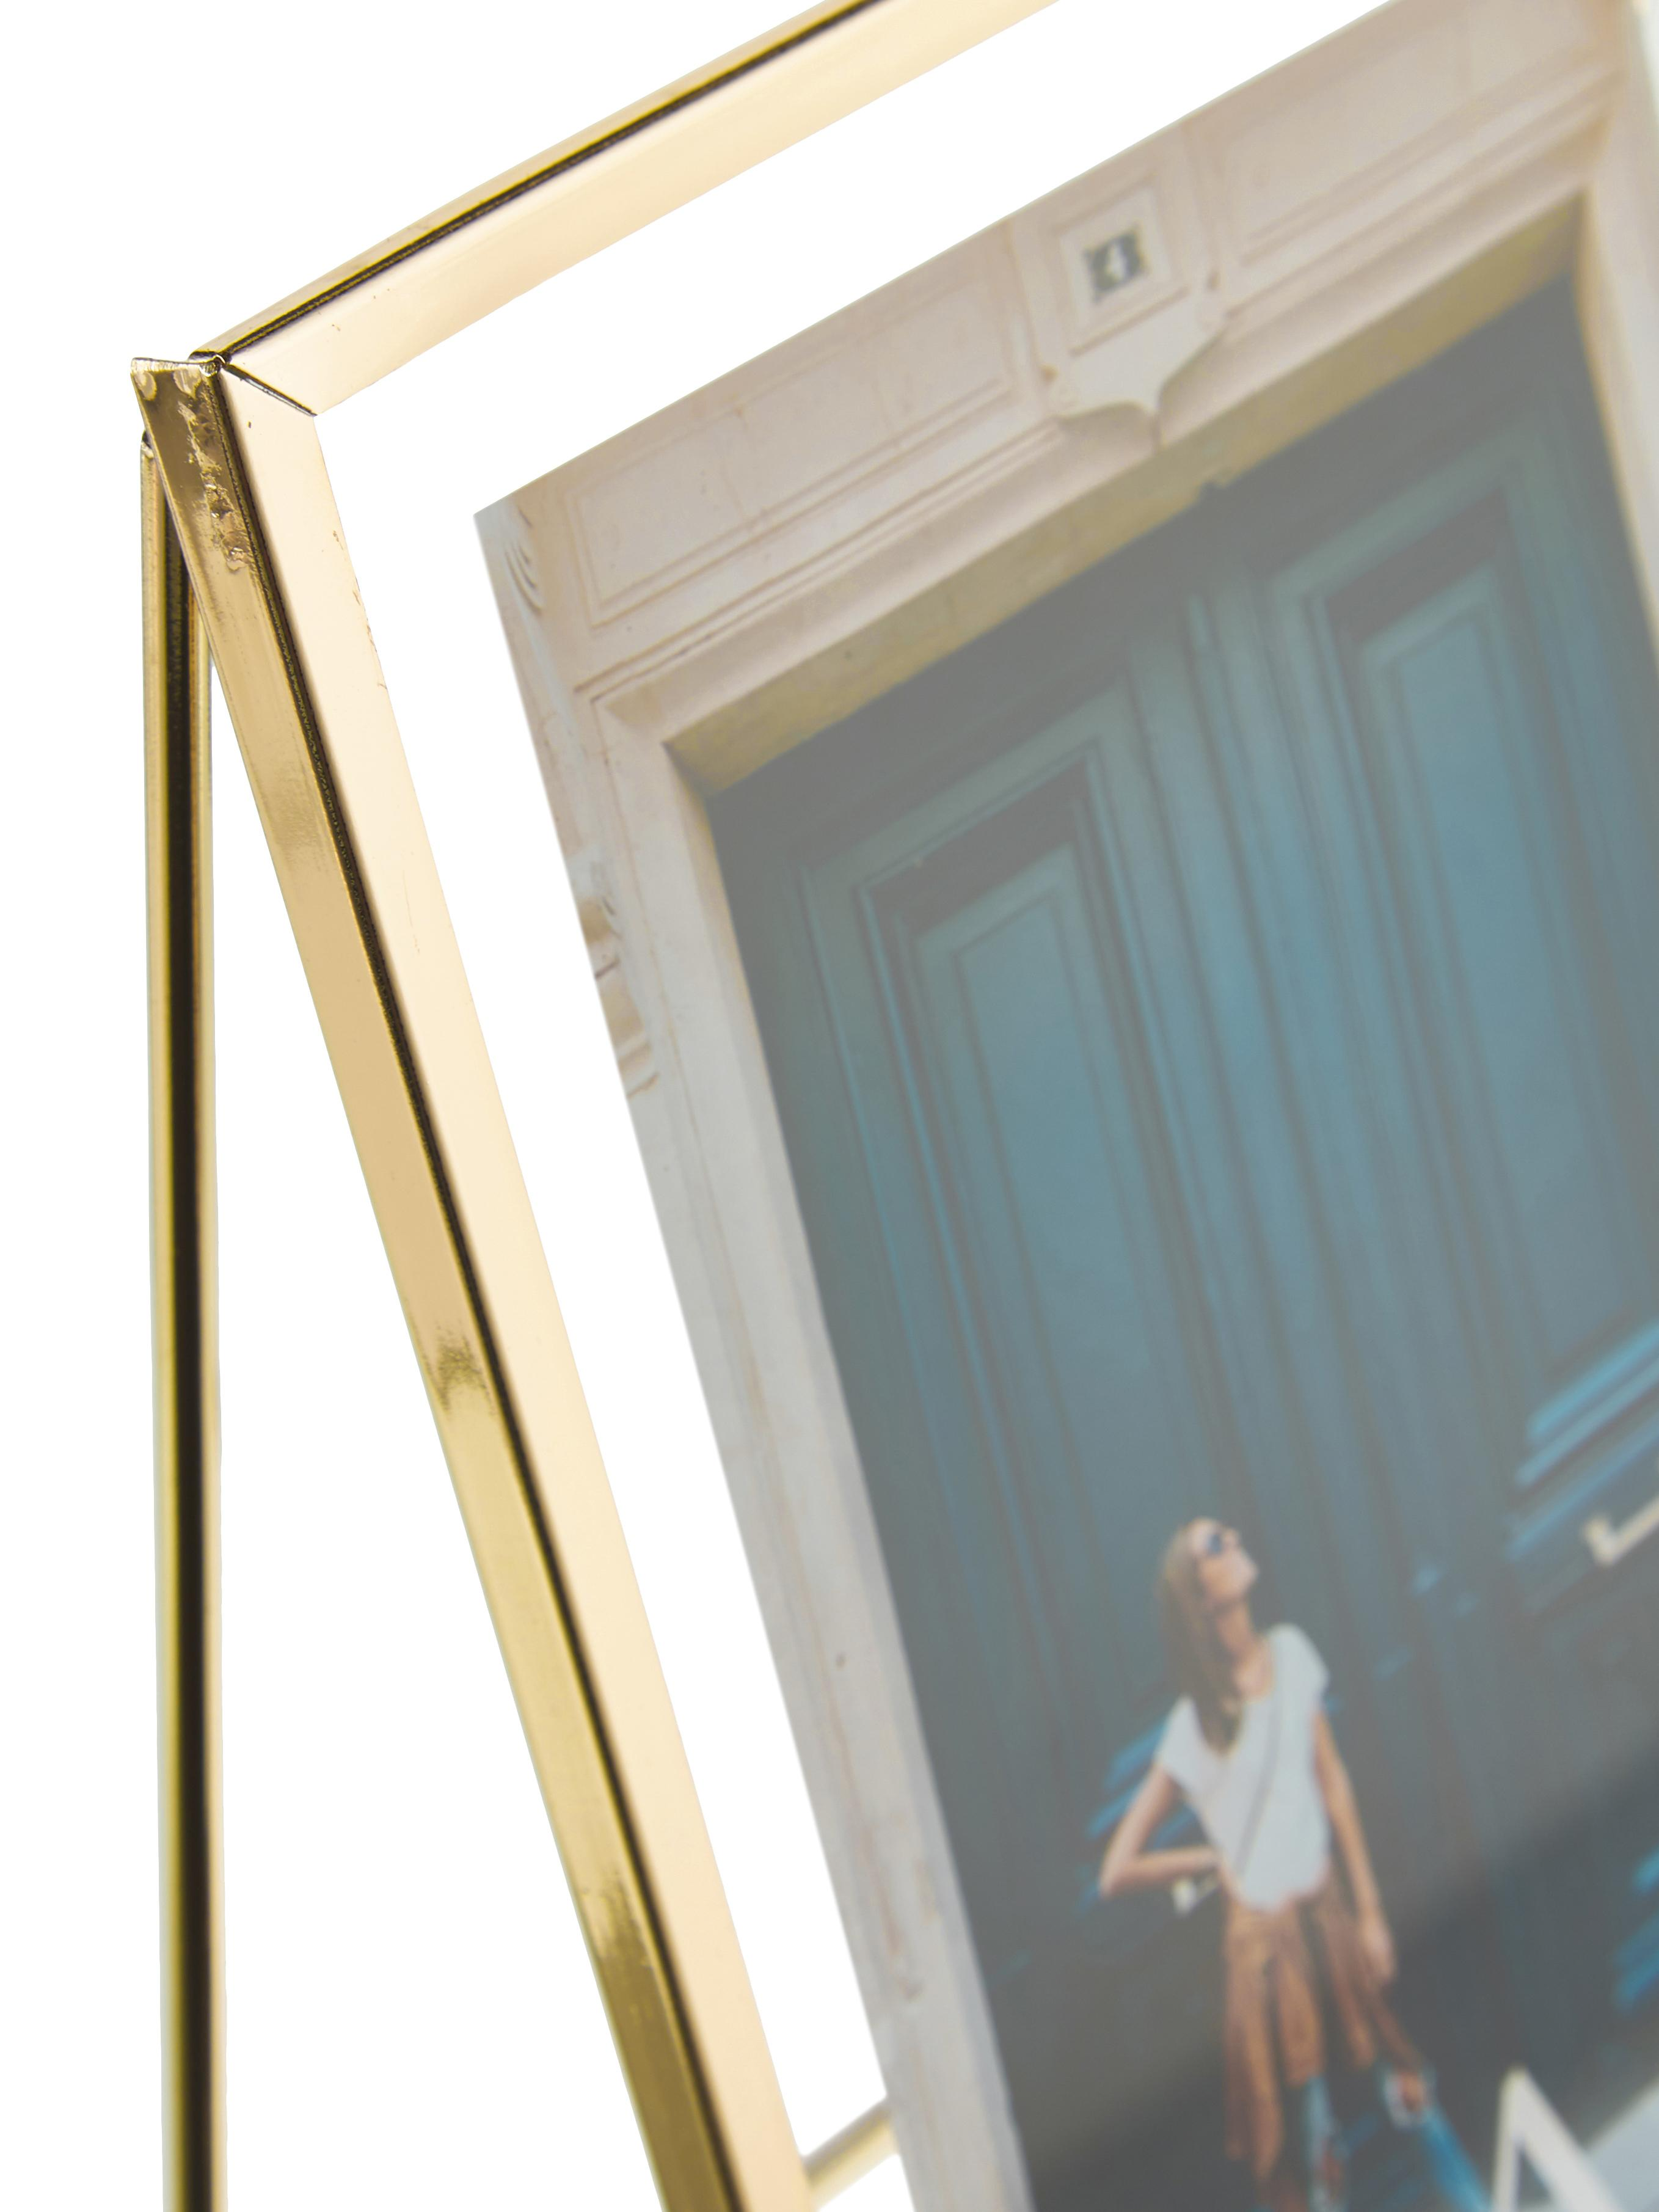 Bilderrahmen Memi, Rahmen: Metall, beschichtet, Front: Glas, Goldfarben, 13 x 18 cm